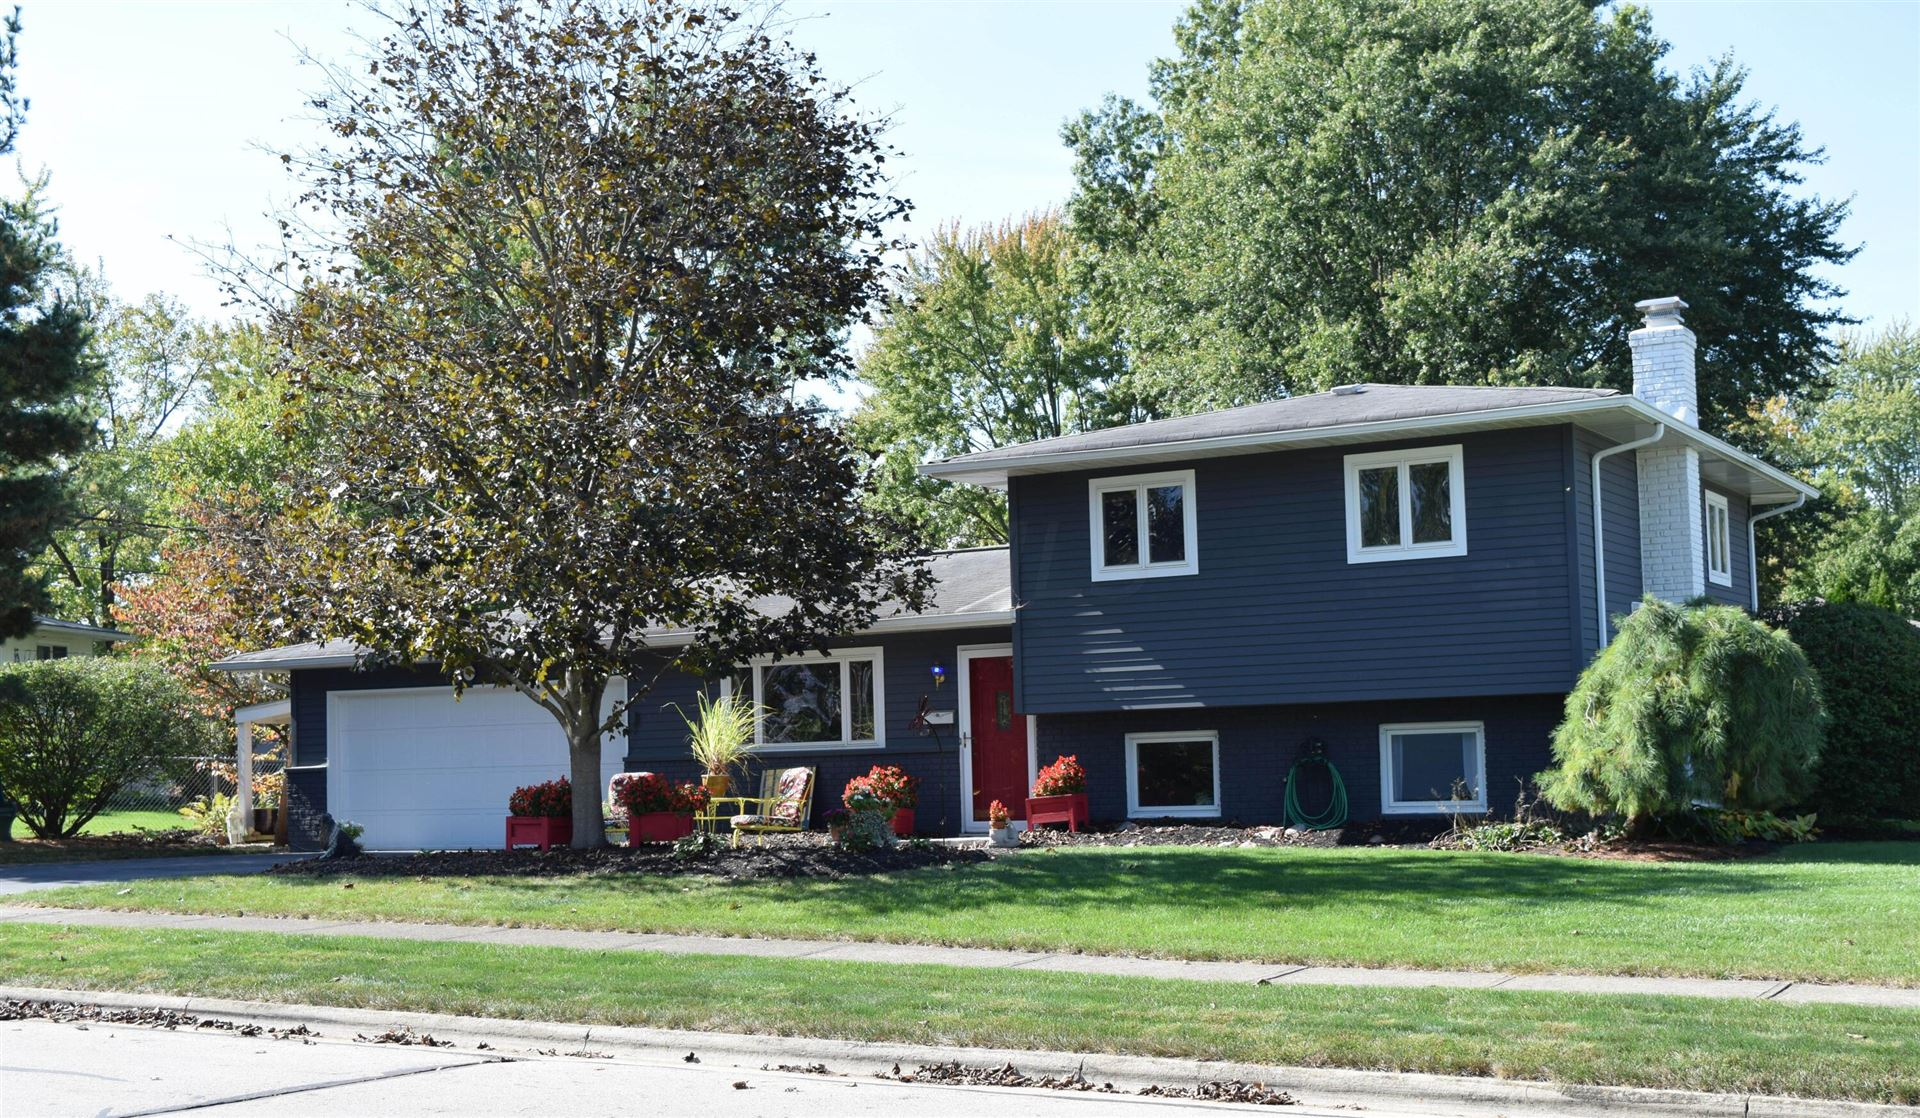 Photo of 391 Seneca Avenue, Westerville, OH 43081 (MLS # 221040898)